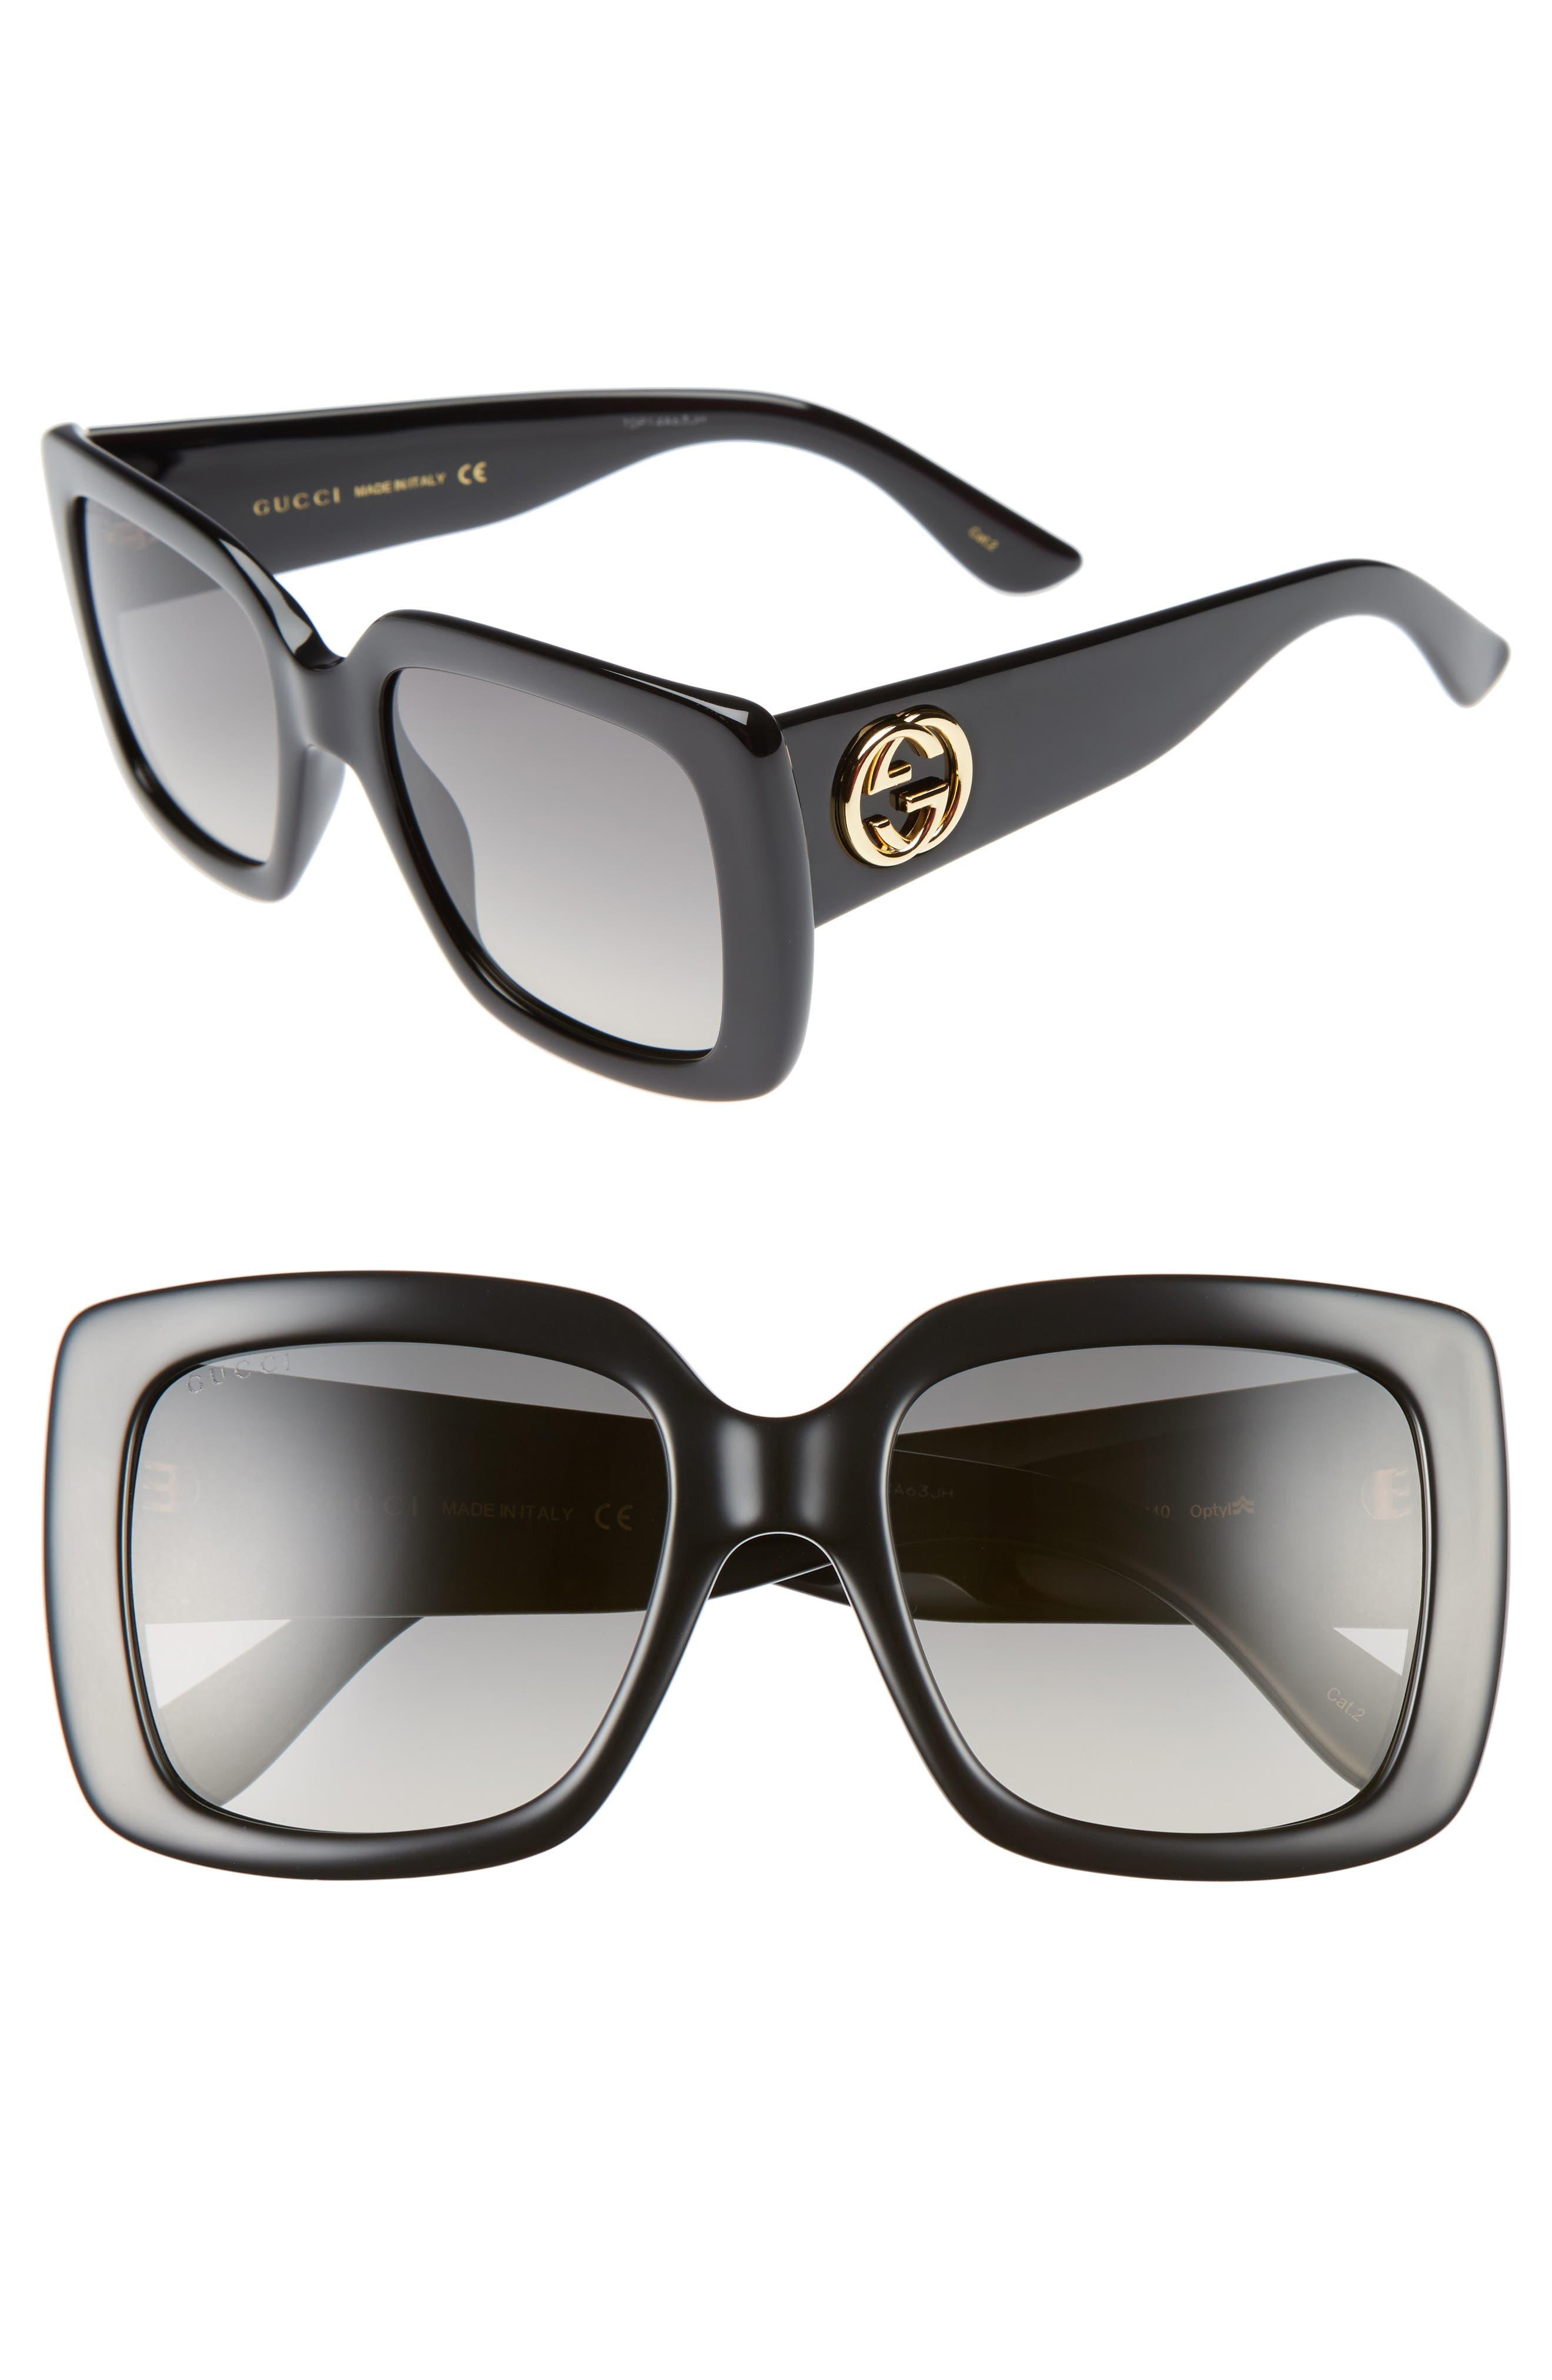 Main Image - Gucci Avana 53mm Square Sunglasses